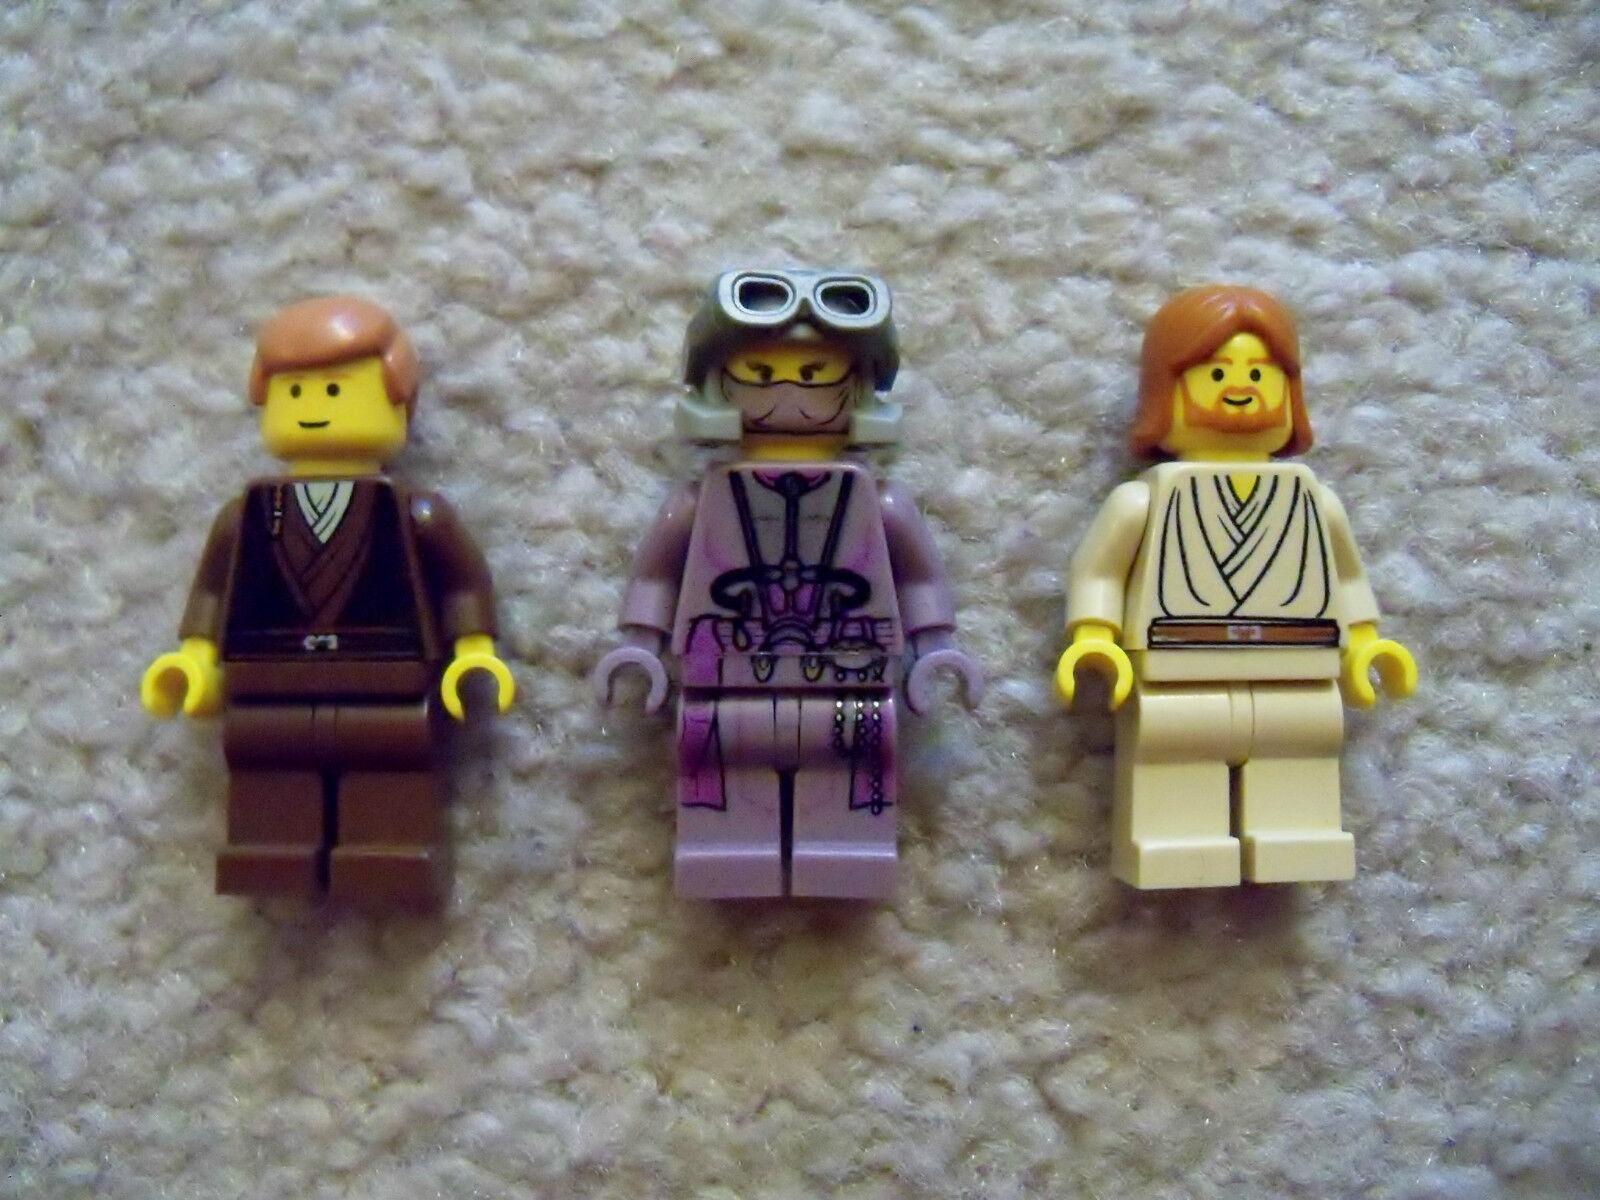 LEGO Star Wars - Rare Original Bounty Hunter Pursuit Minifigs 7133 - Zam Wesell